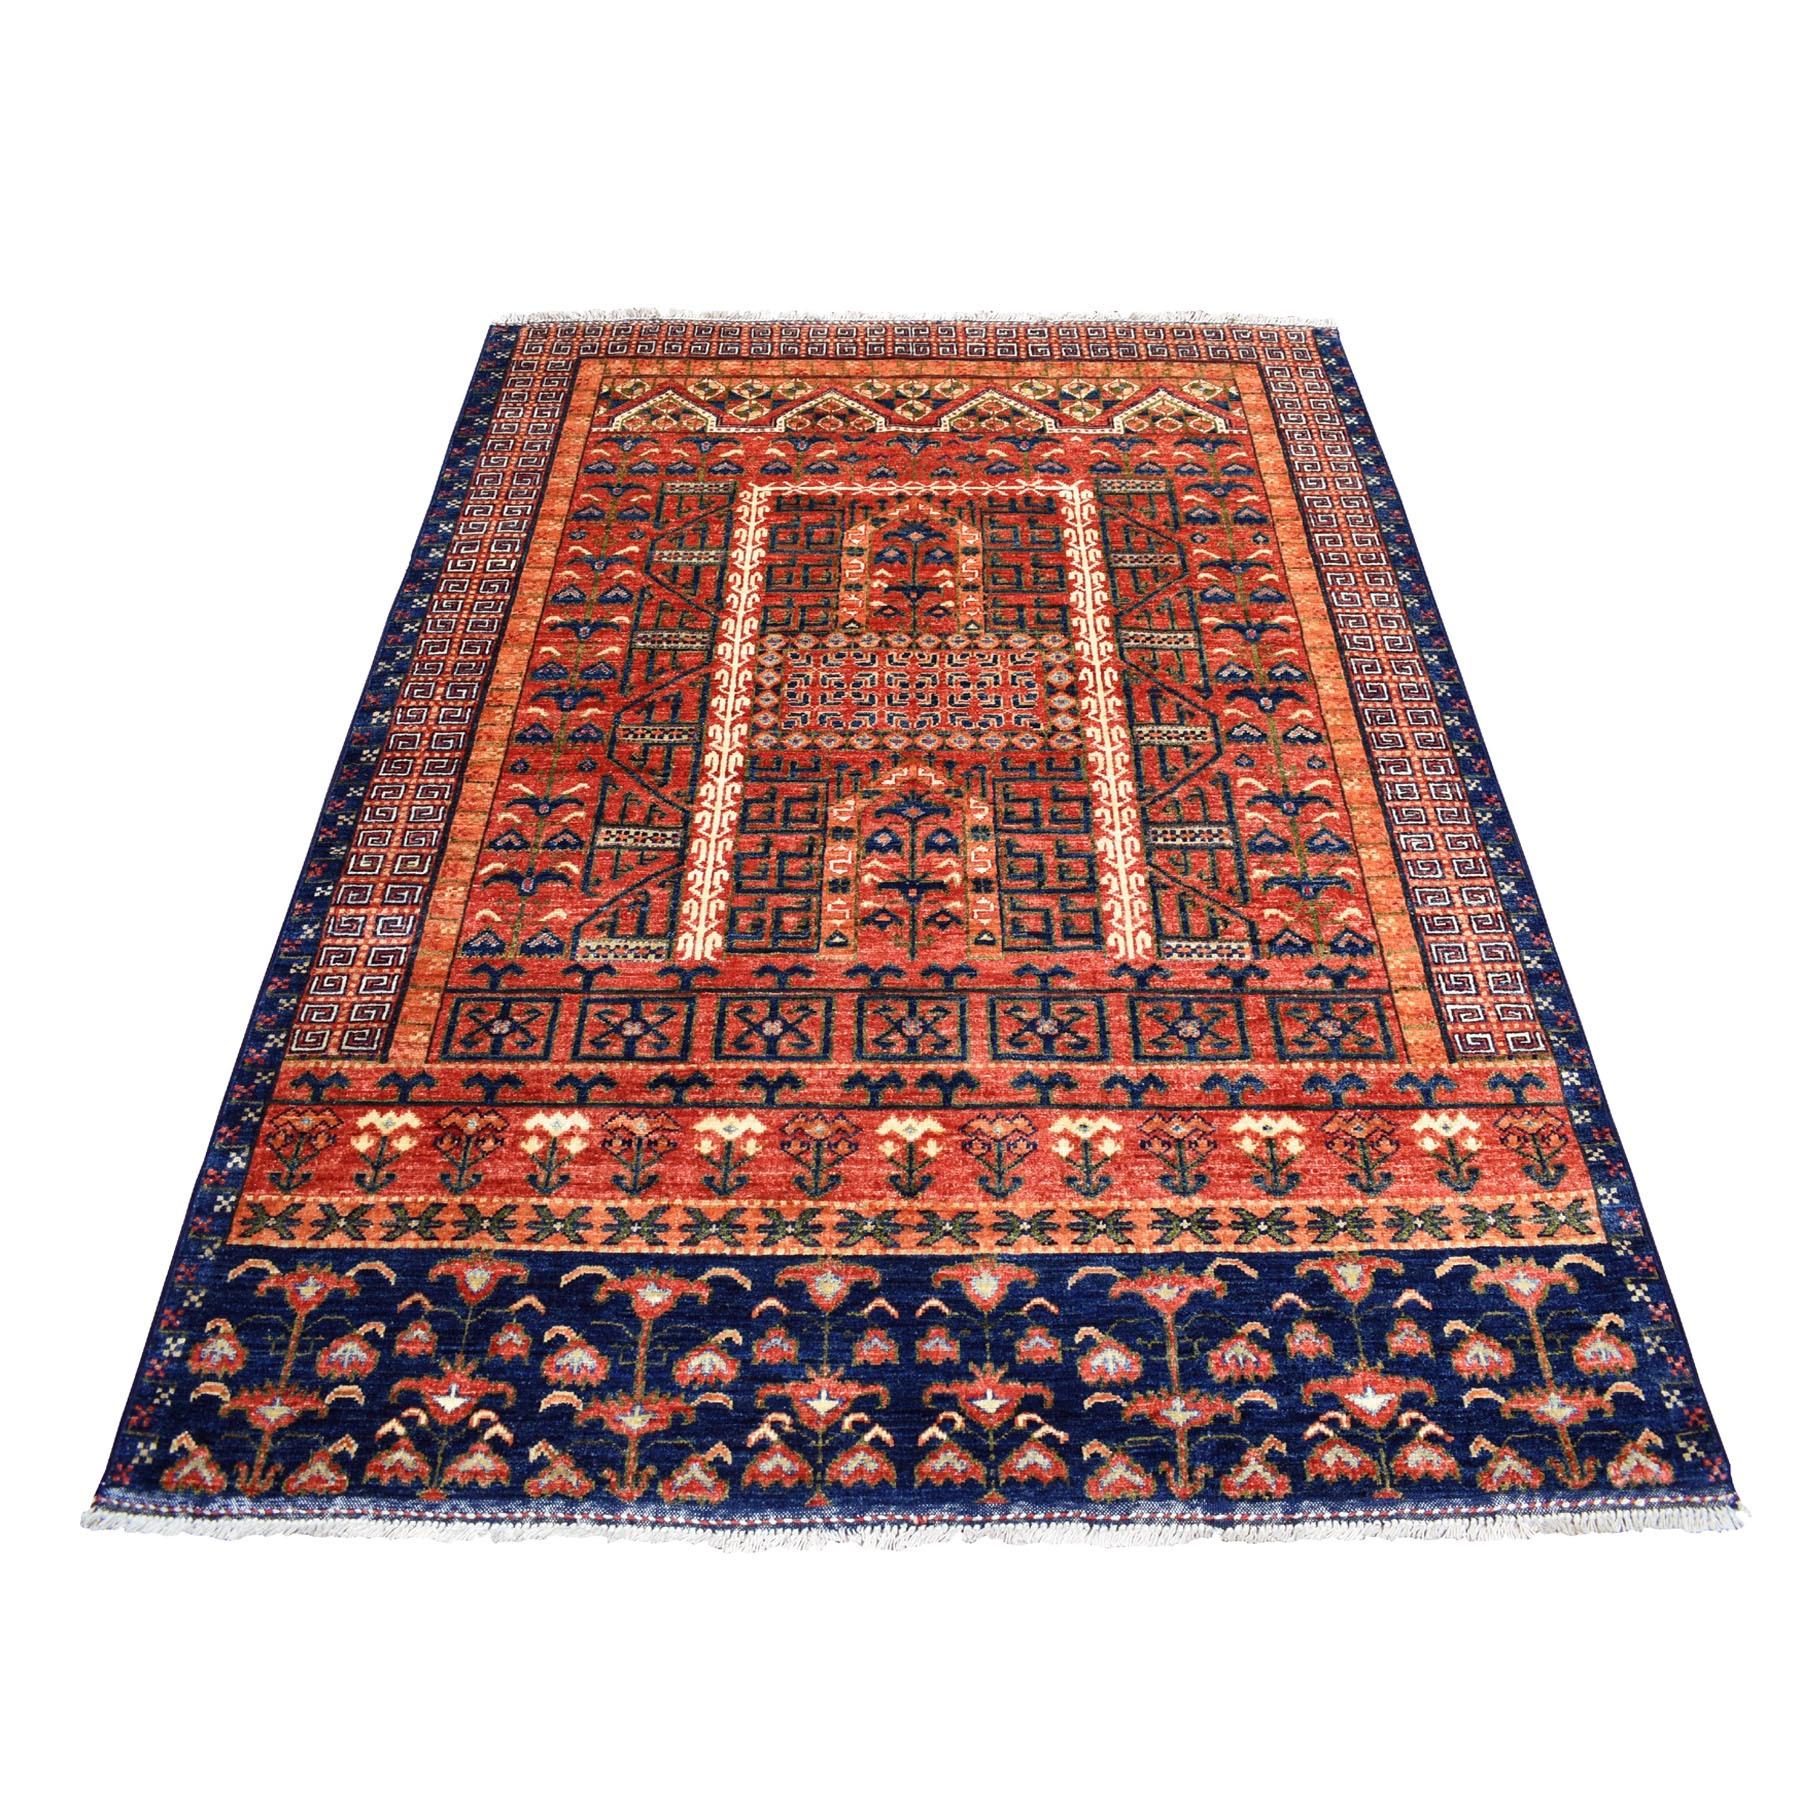 "4'10""x6'4"" Red Afghan Ersari Prayer Design Pure Wool Hand Knotted Oriental Rug 53122"